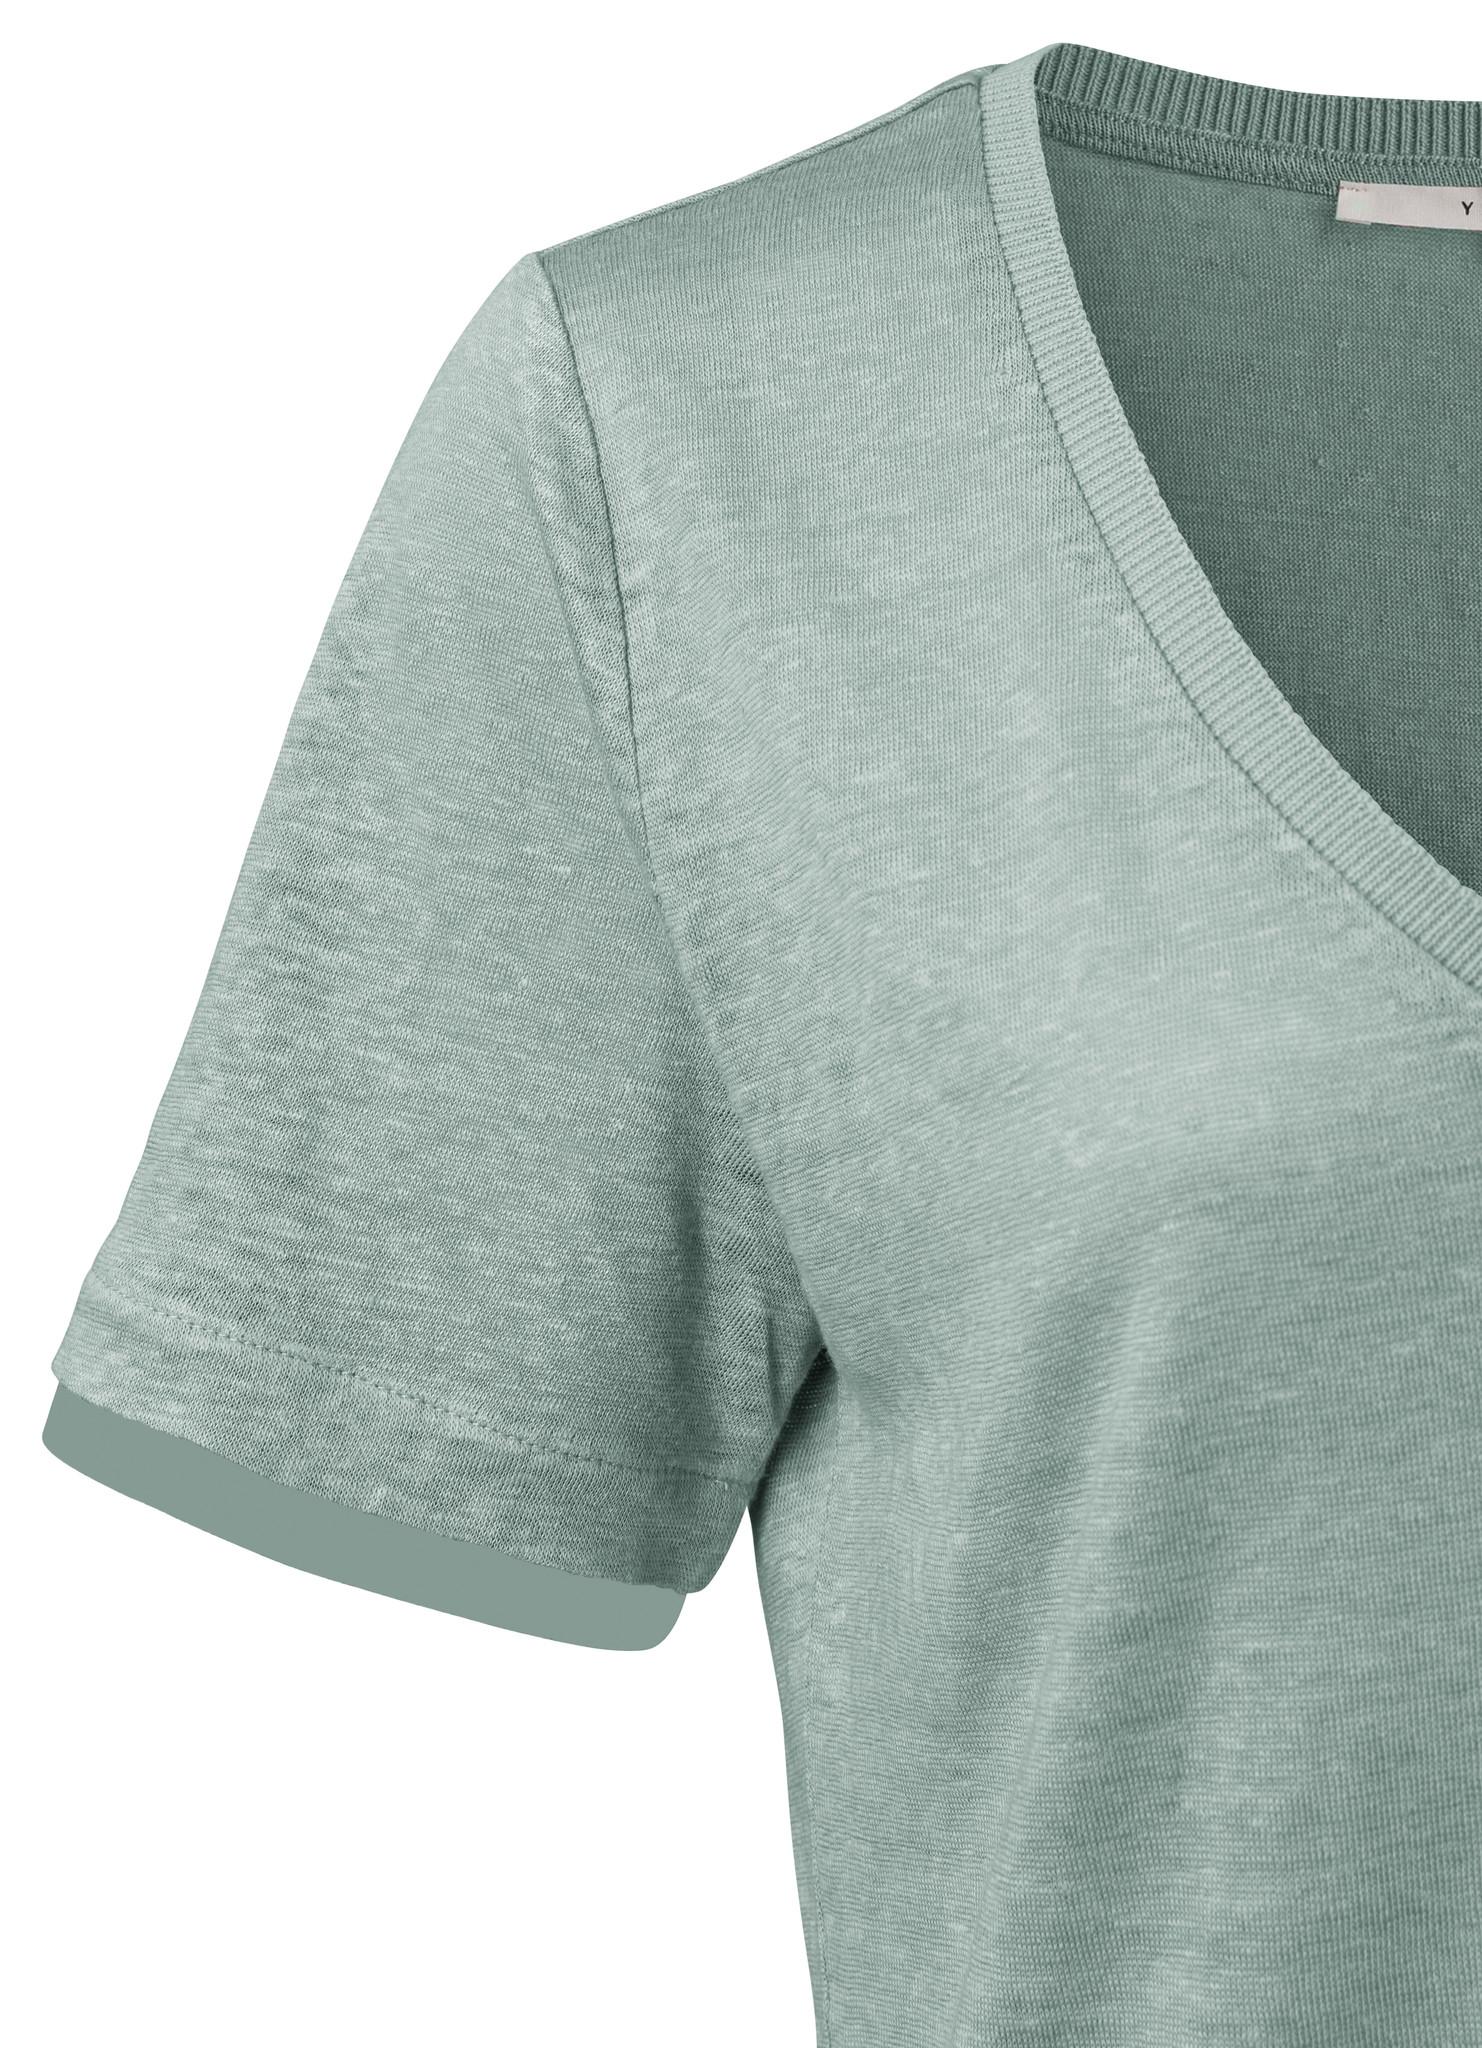 yaya V-neck tee with wove 1919168-113-2